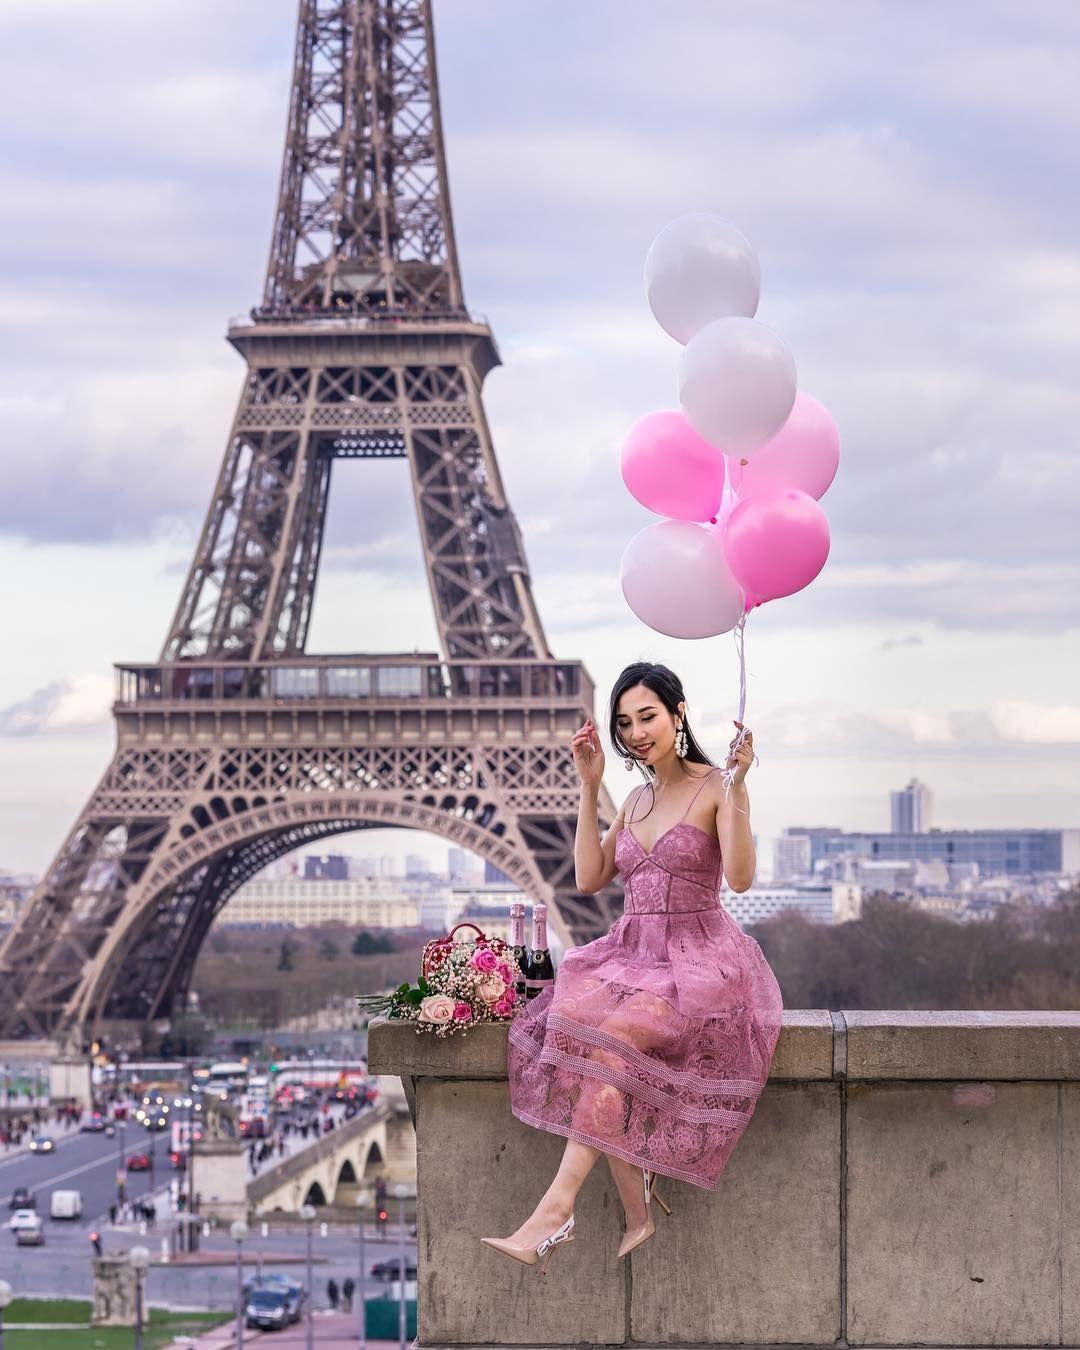 Красивые виды парижа и парижанок фото